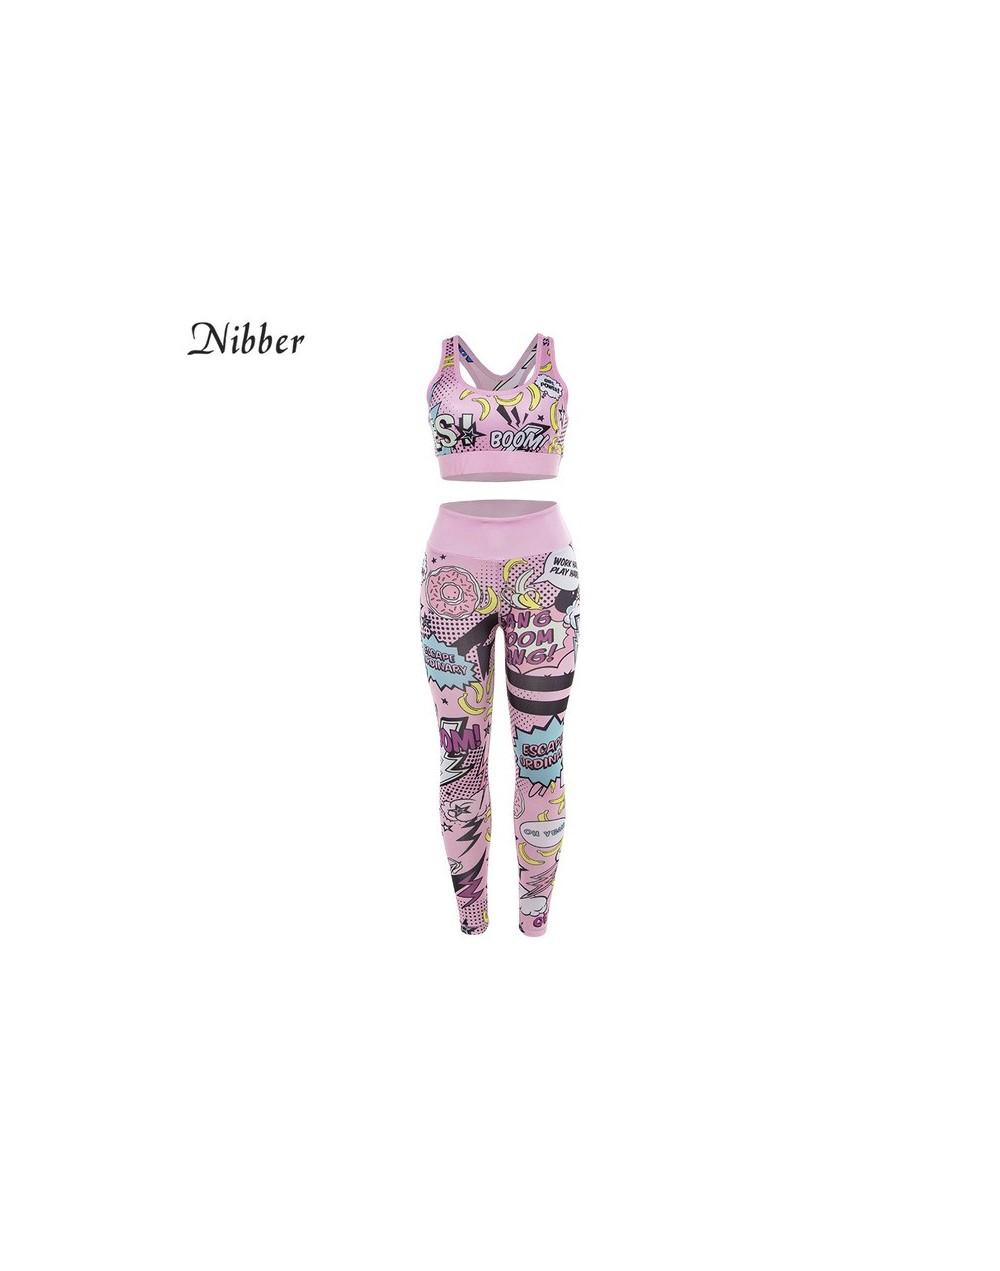 summer Milk silk Cartoon Fitness wear 2two pieces sets 2019 stretch Slim Jogging sportswear Basic crop top camis leggings - ...